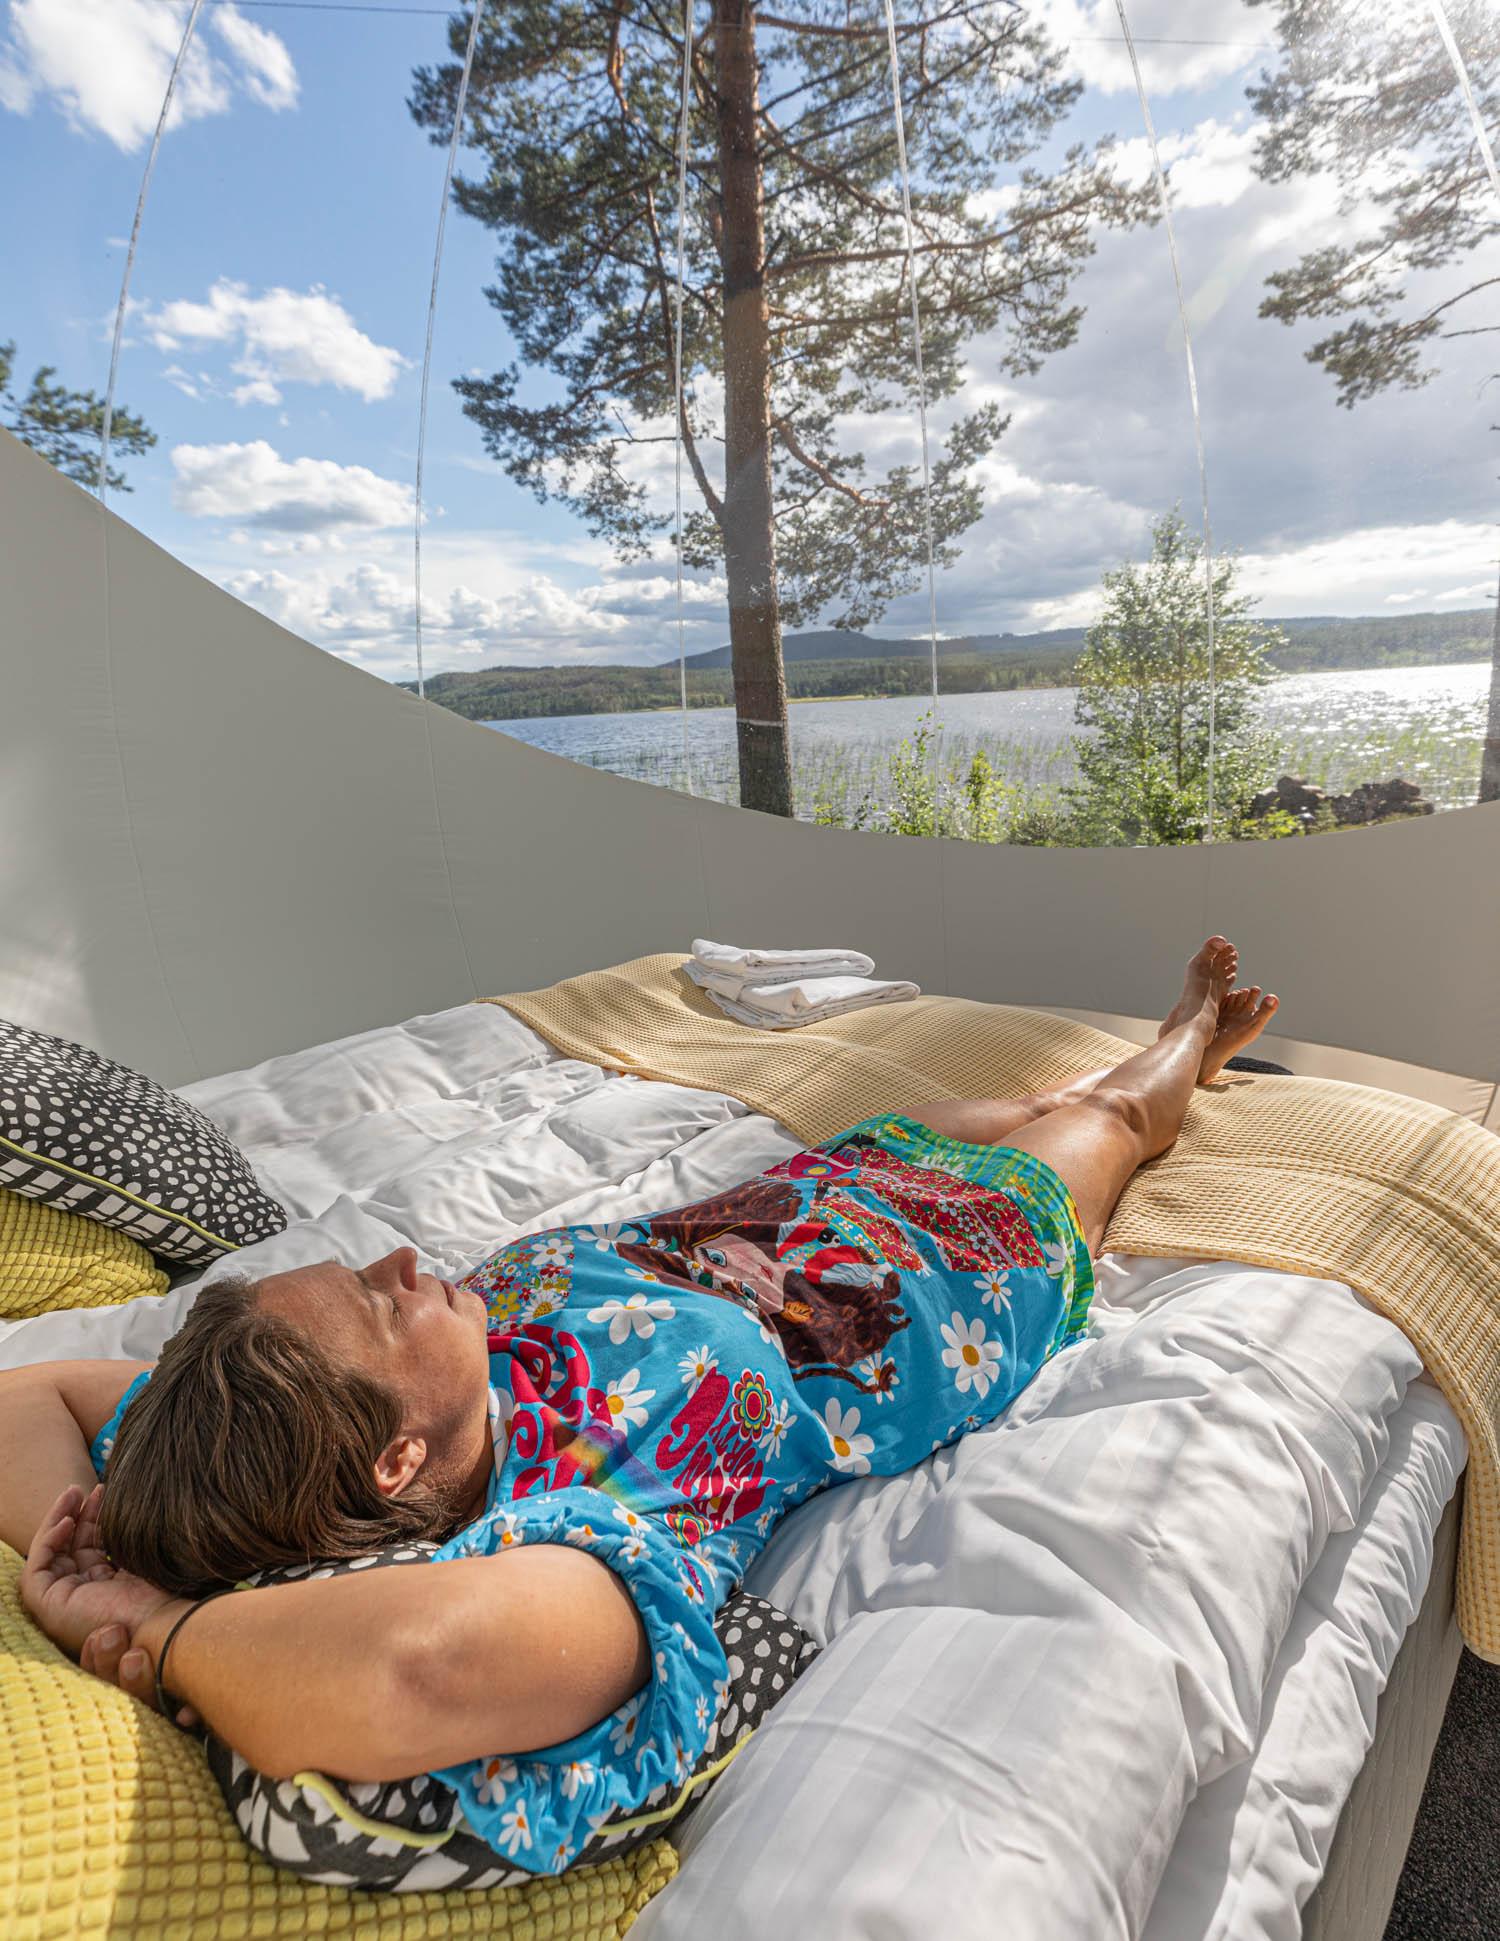 Sleep in a bubble in Dalarna